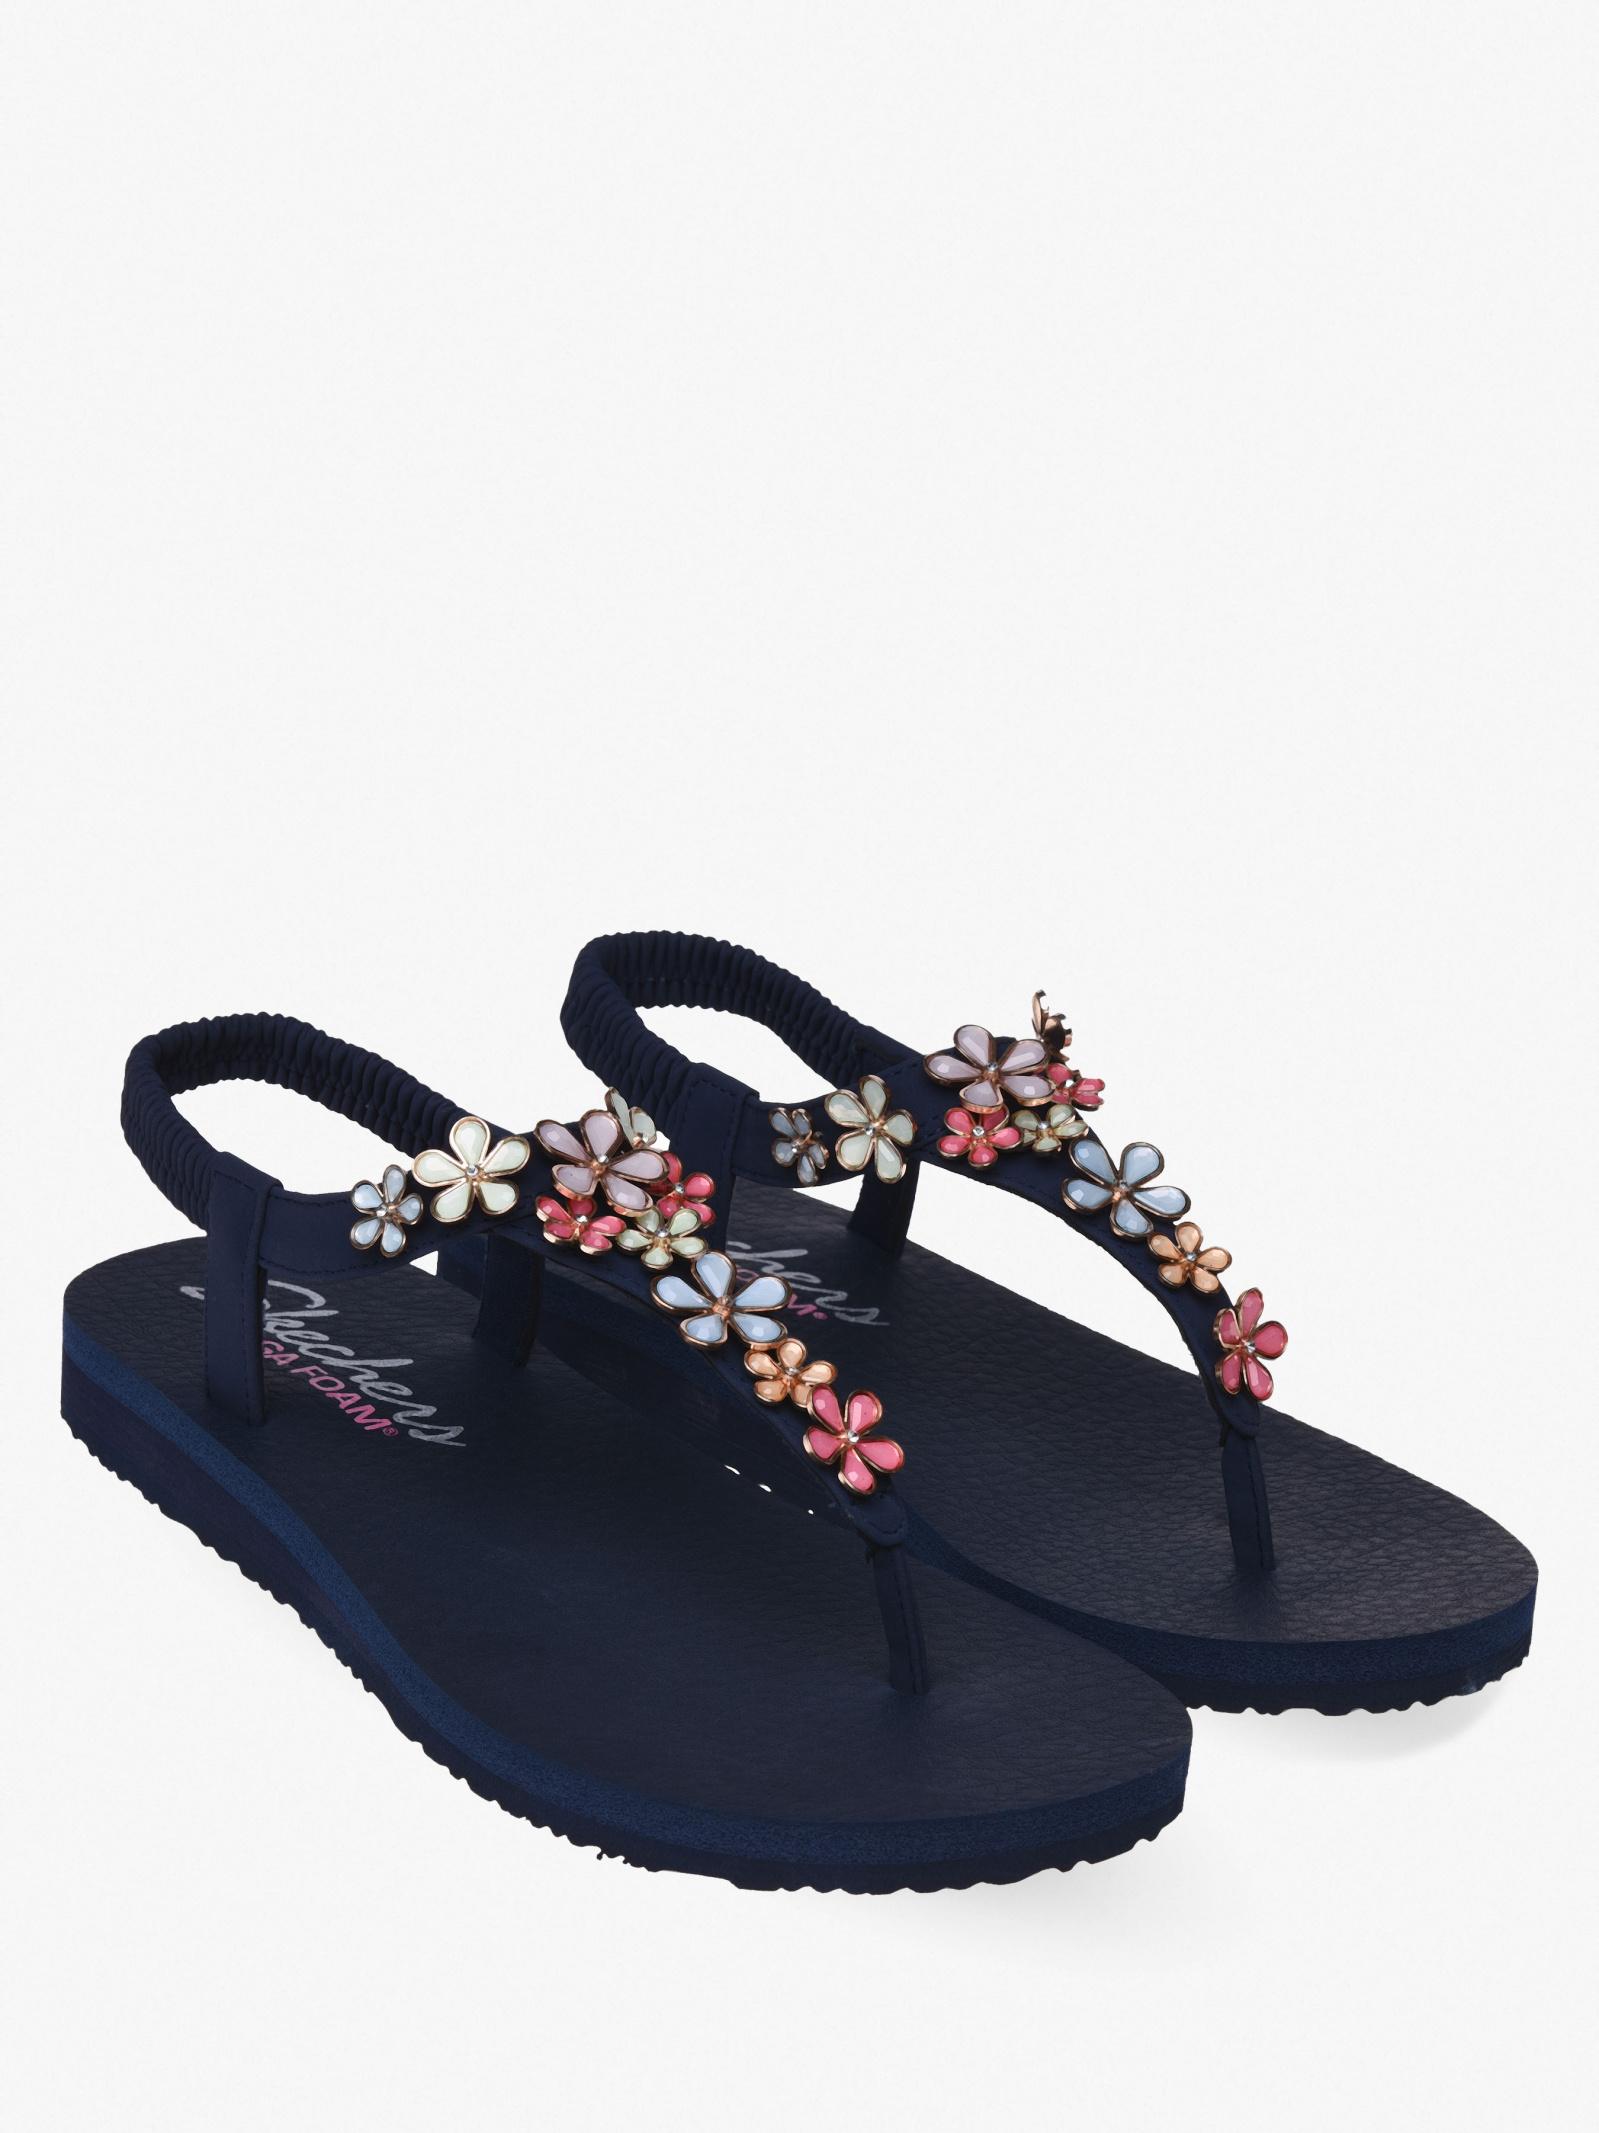 Сандалі  для жінок Skechers 32922 NVMT брендове взуття, 2017